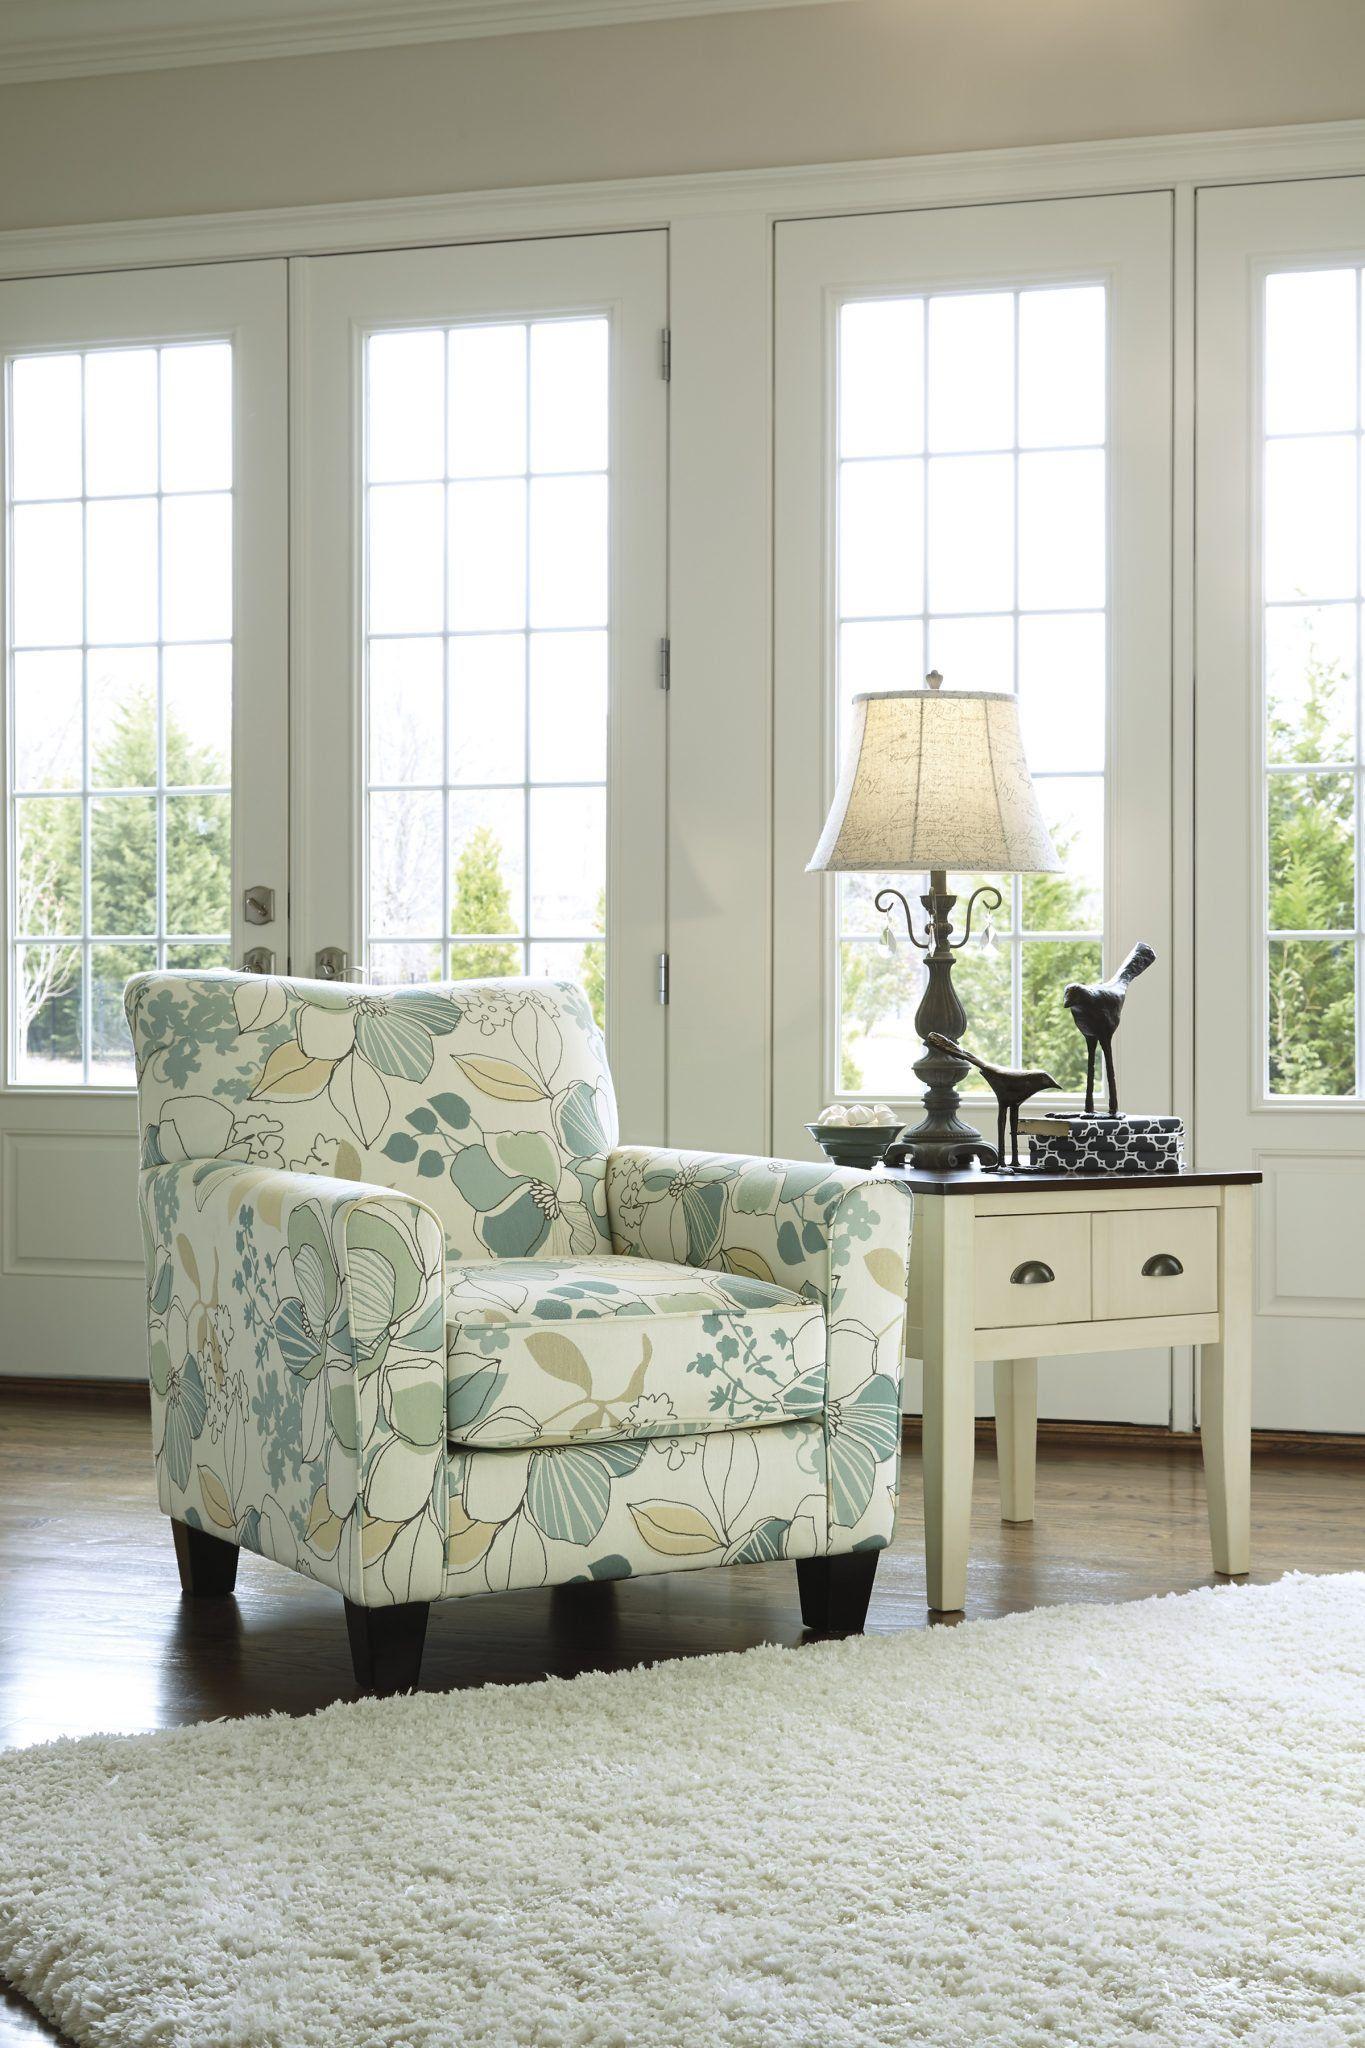 Ashley Möbel Queen Bett Furniture Home Leder Sofa Set Lounge Sessel